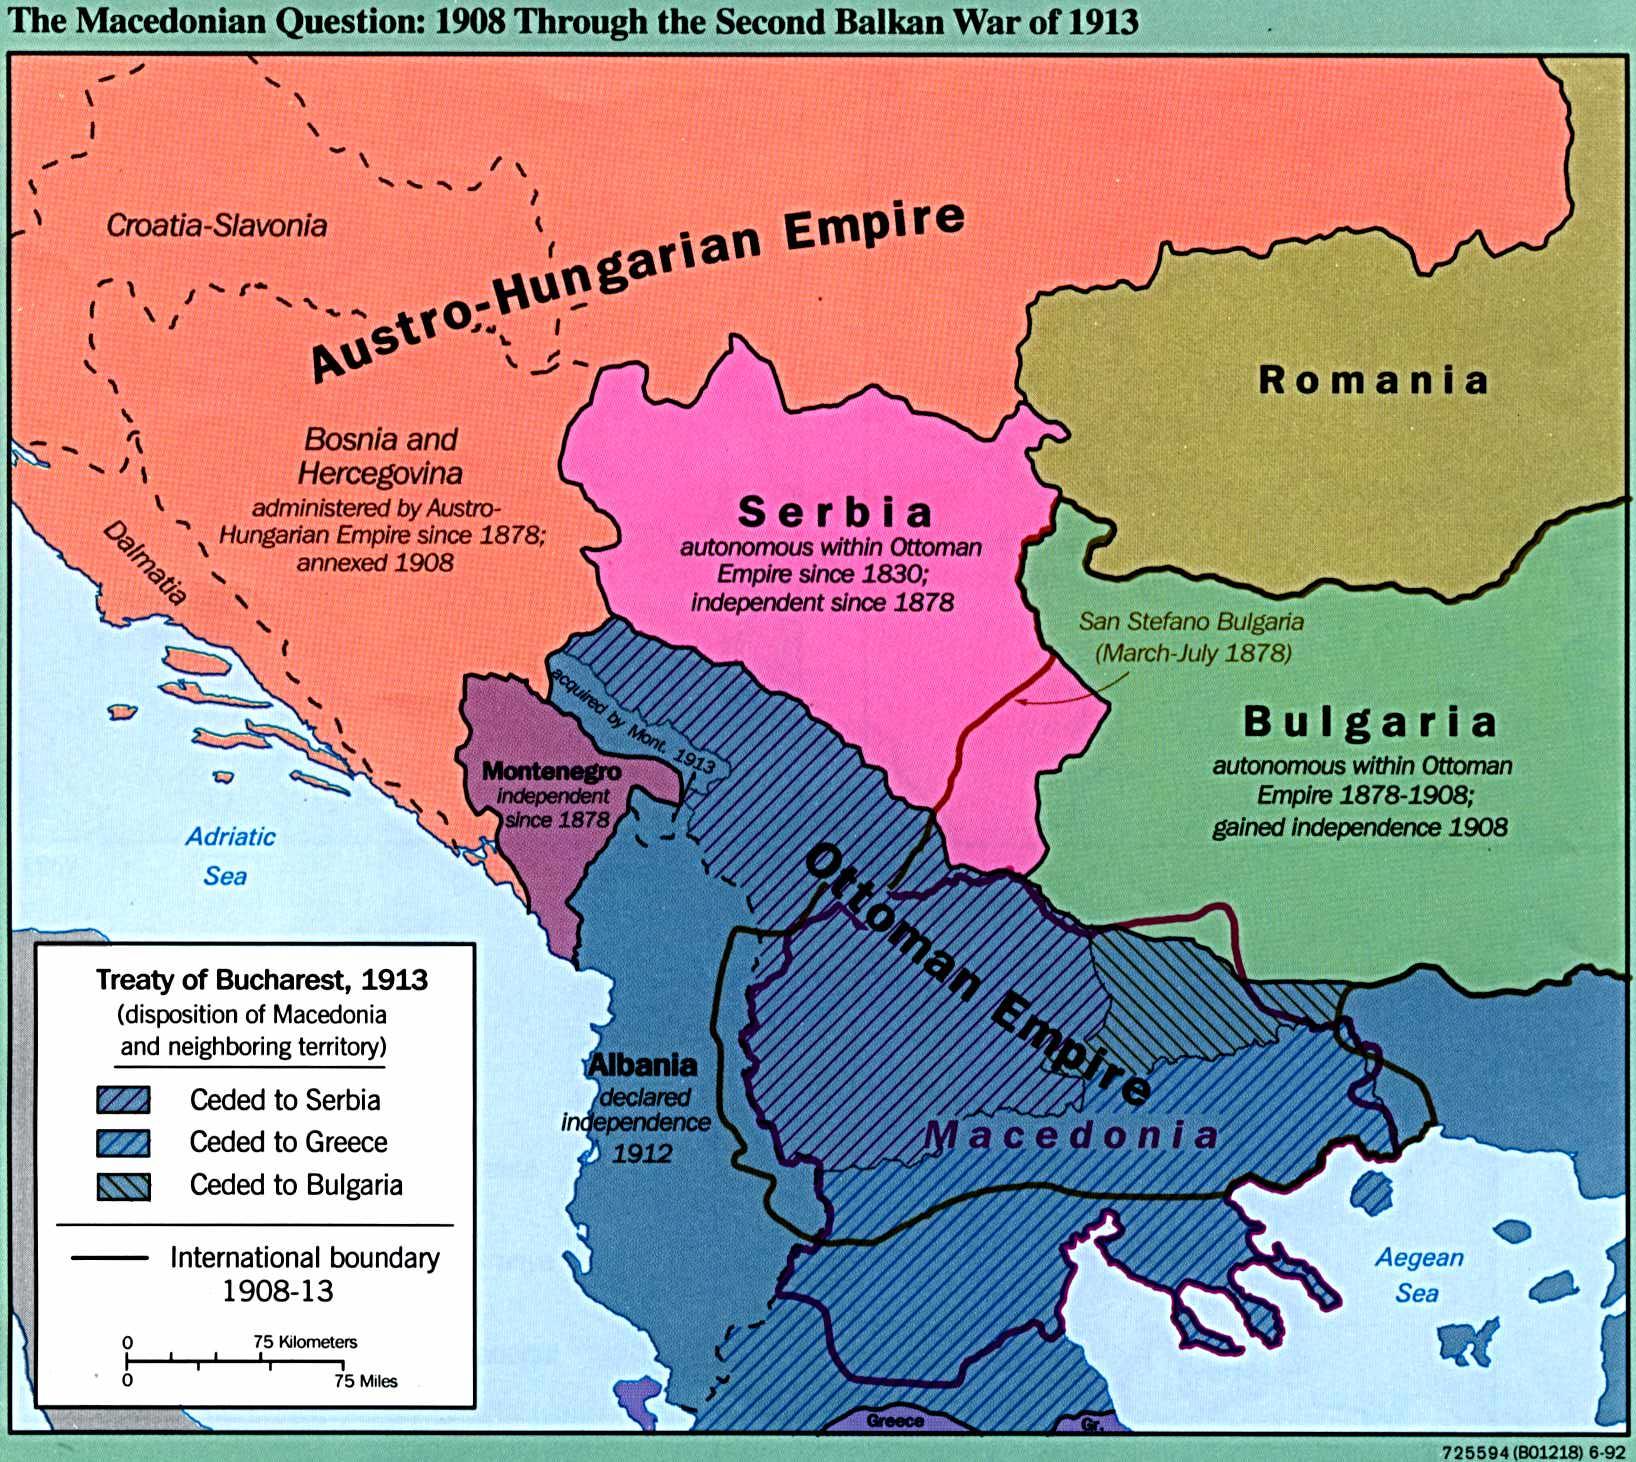 1Up Travel - Maps of Macedonia.Balkan Region: The Macedonian ...